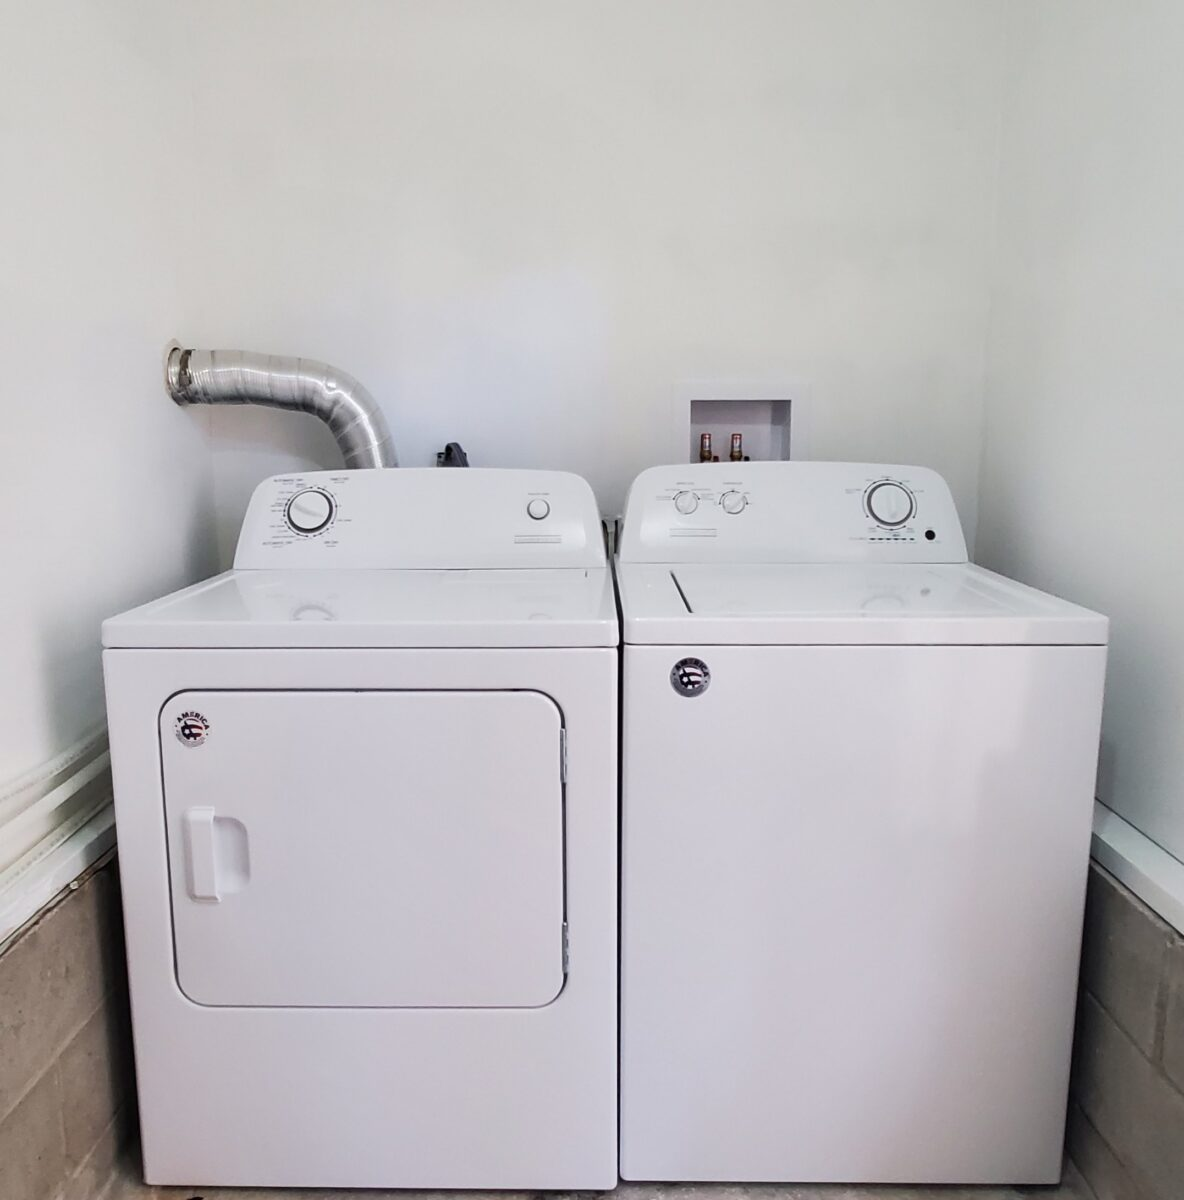 Chestnut washer dryer